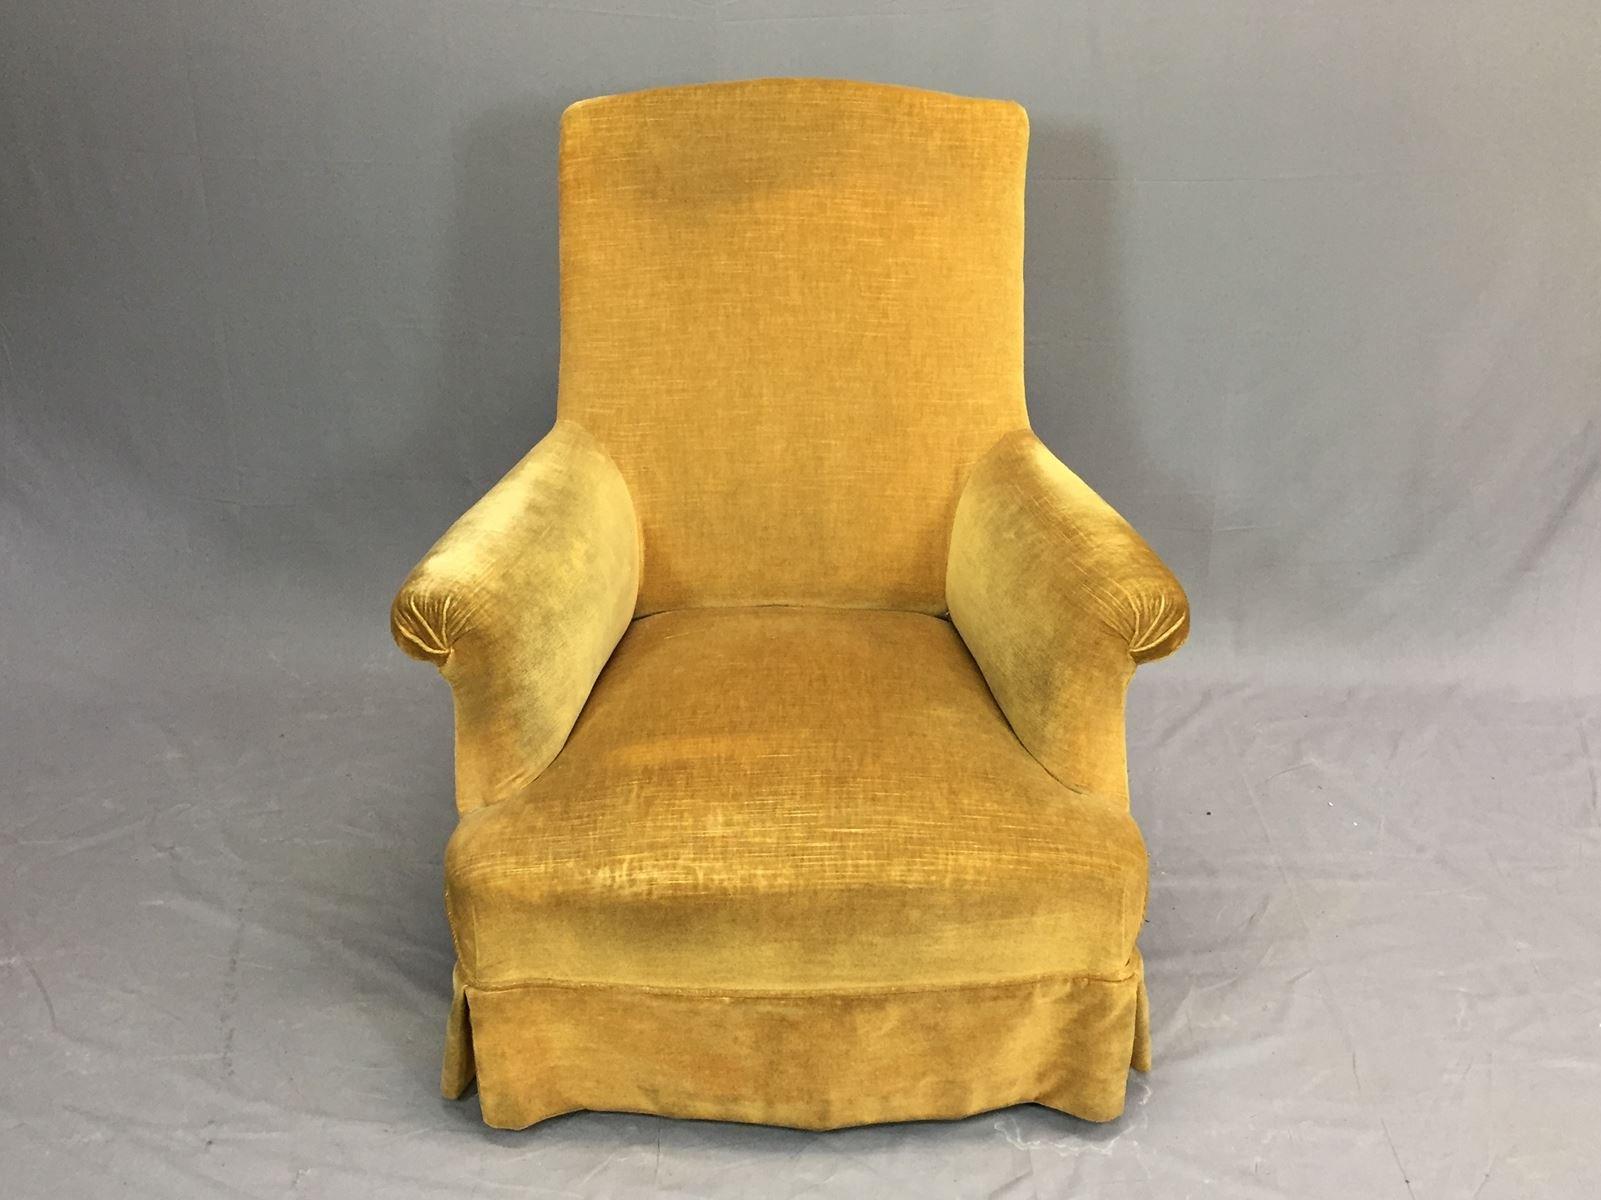 Merveilleux Antique Lounge Chair